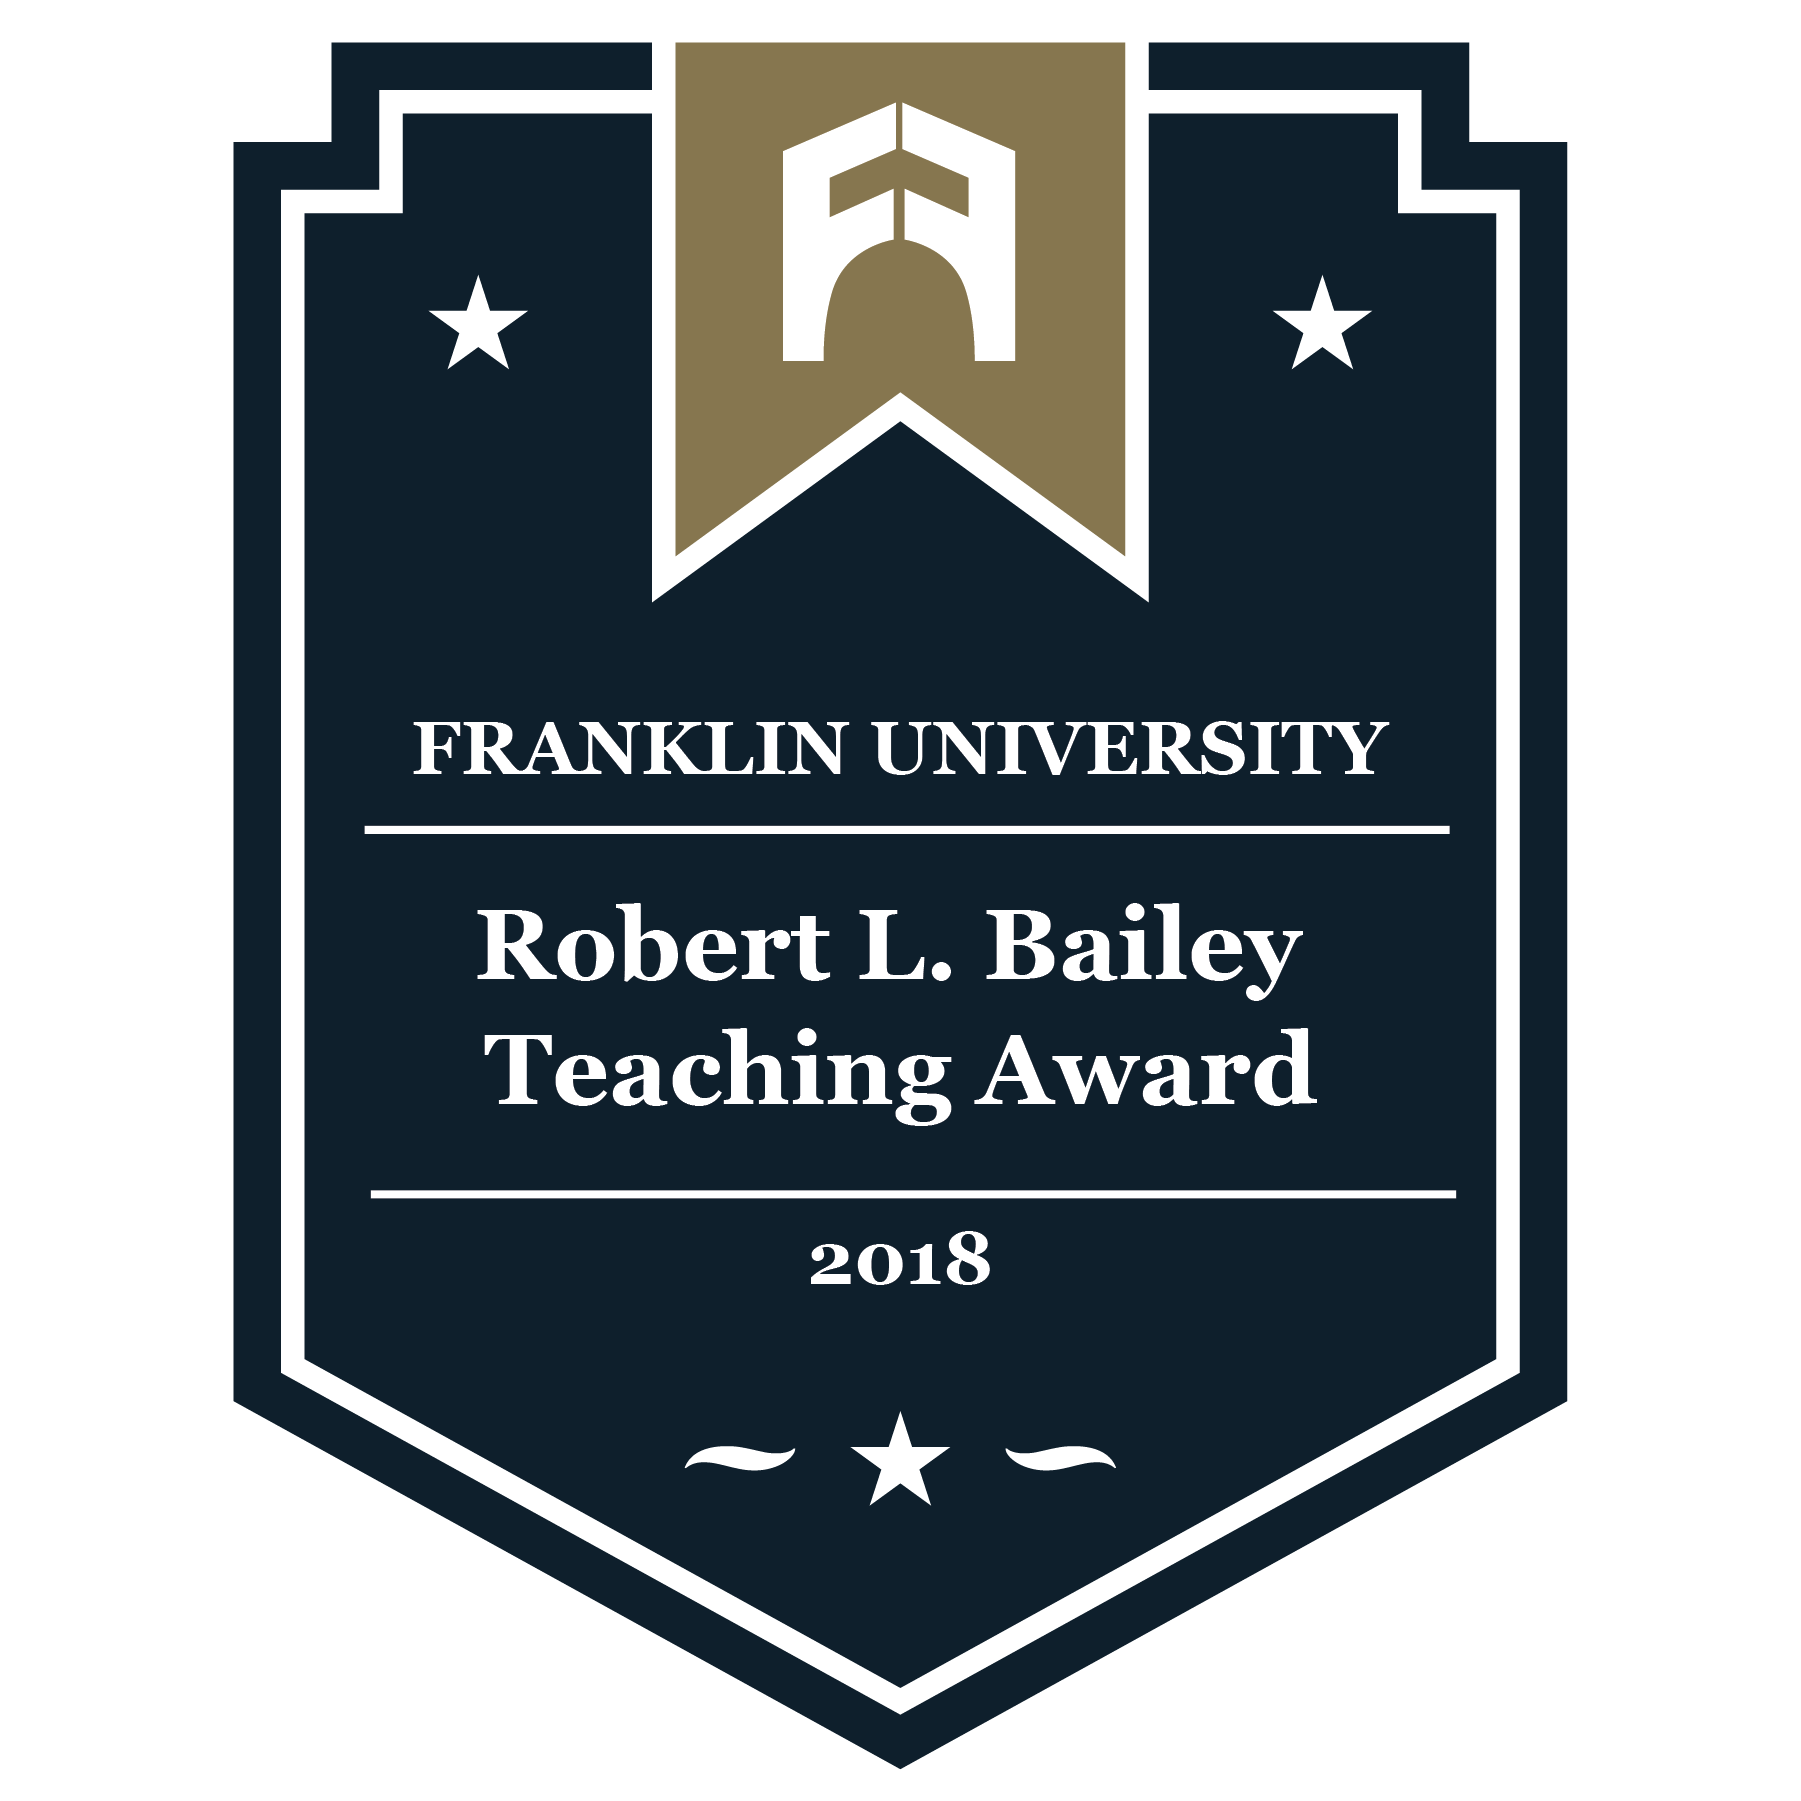 2018 Robert L. Bailey Teaching Award